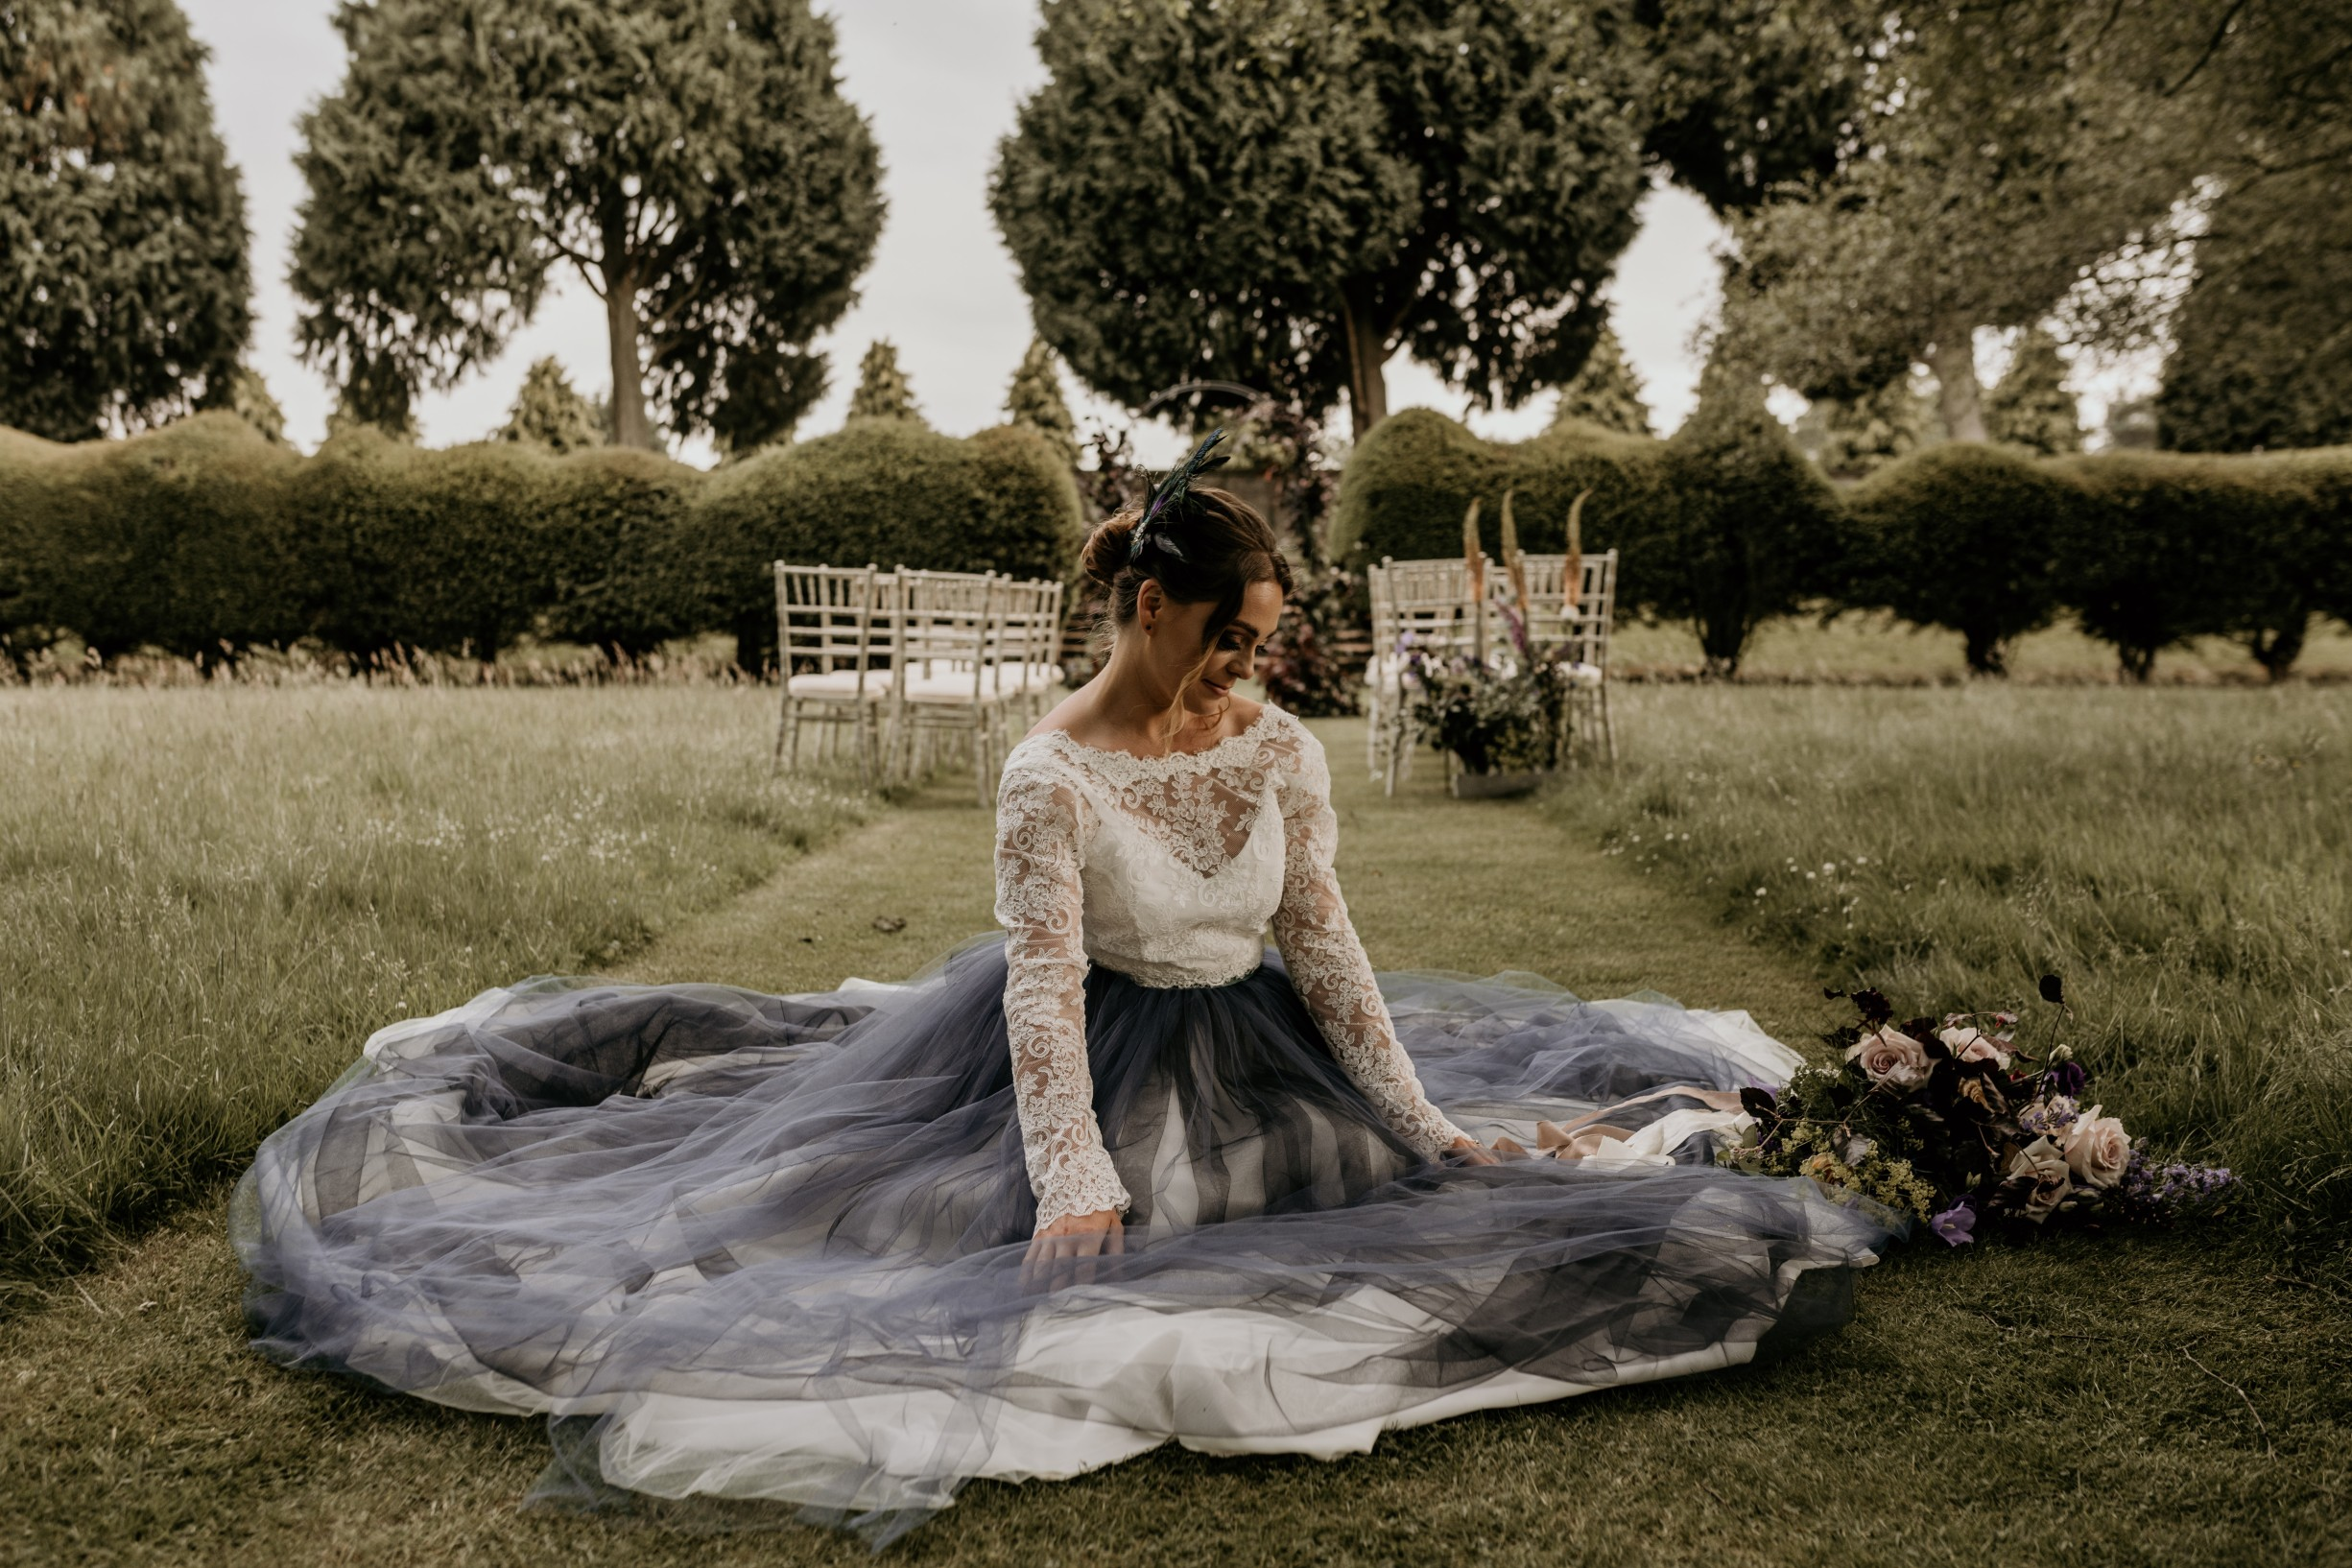 unique wedding dress - alternative wedding dress - coloured wedding dress - black wedding dress - alternative bridal wear - unconventional wedding